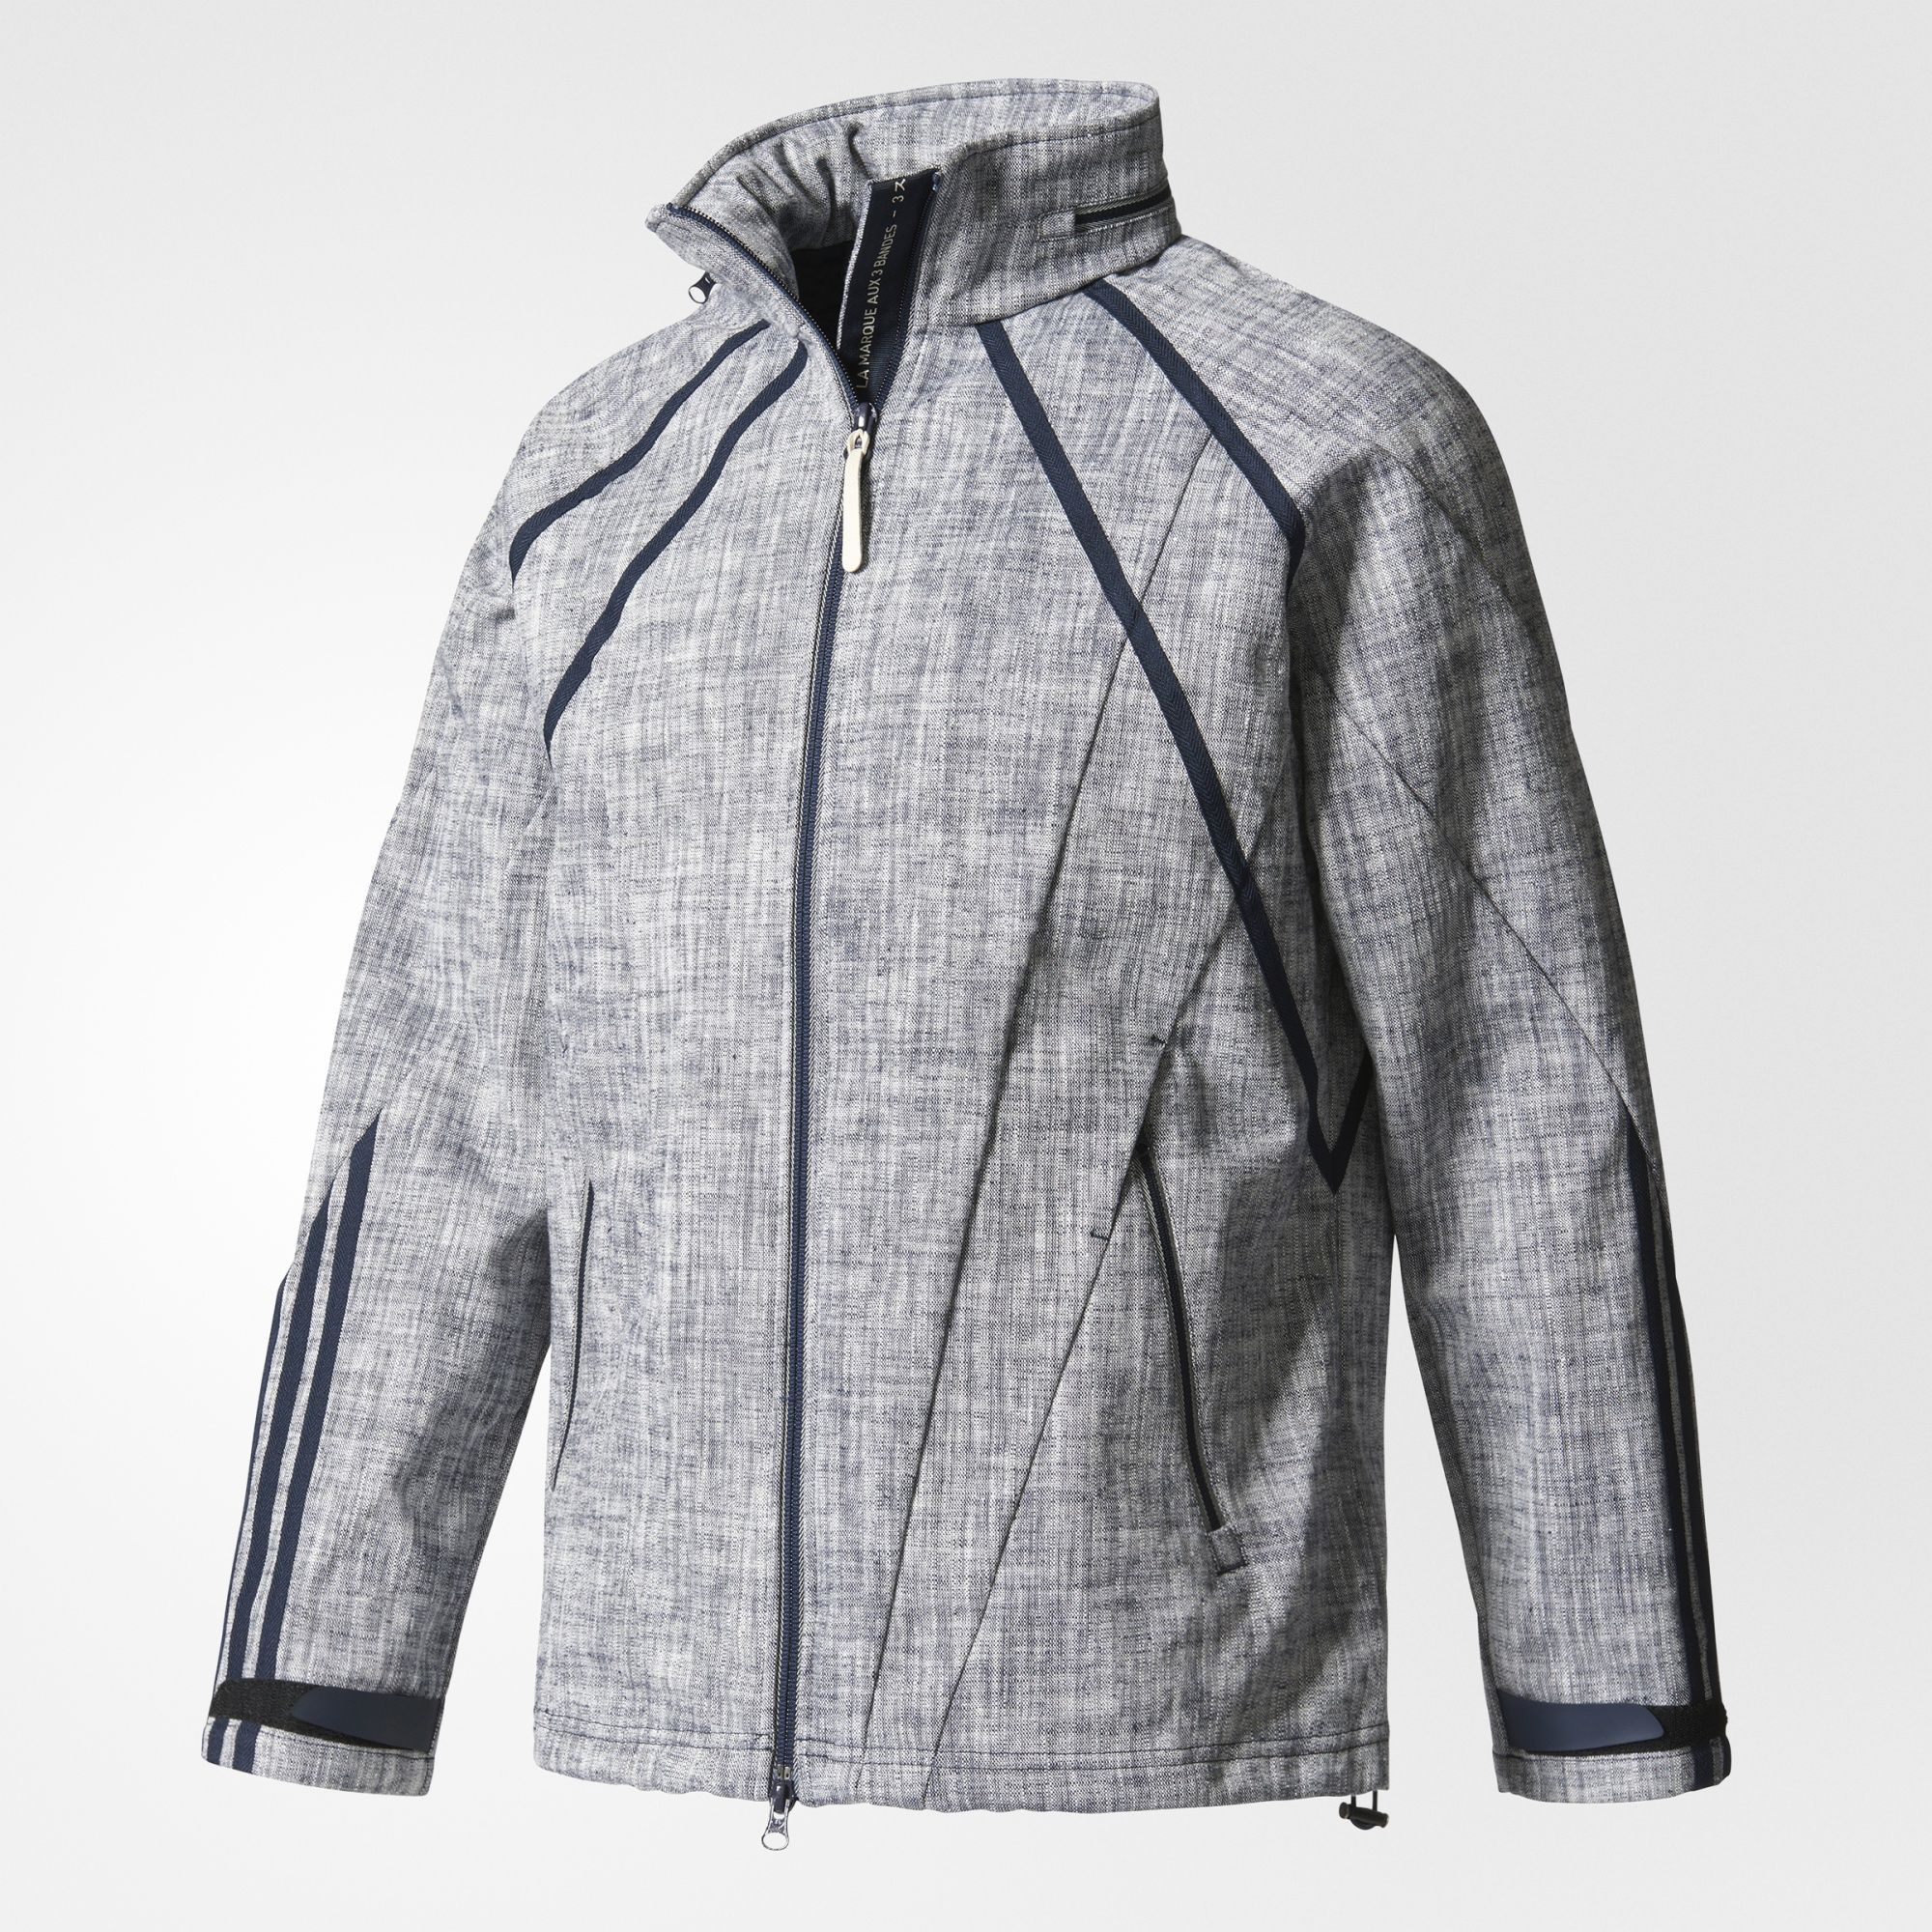 fe3b0da922e3 adidas - Chambreaker Track Jacket